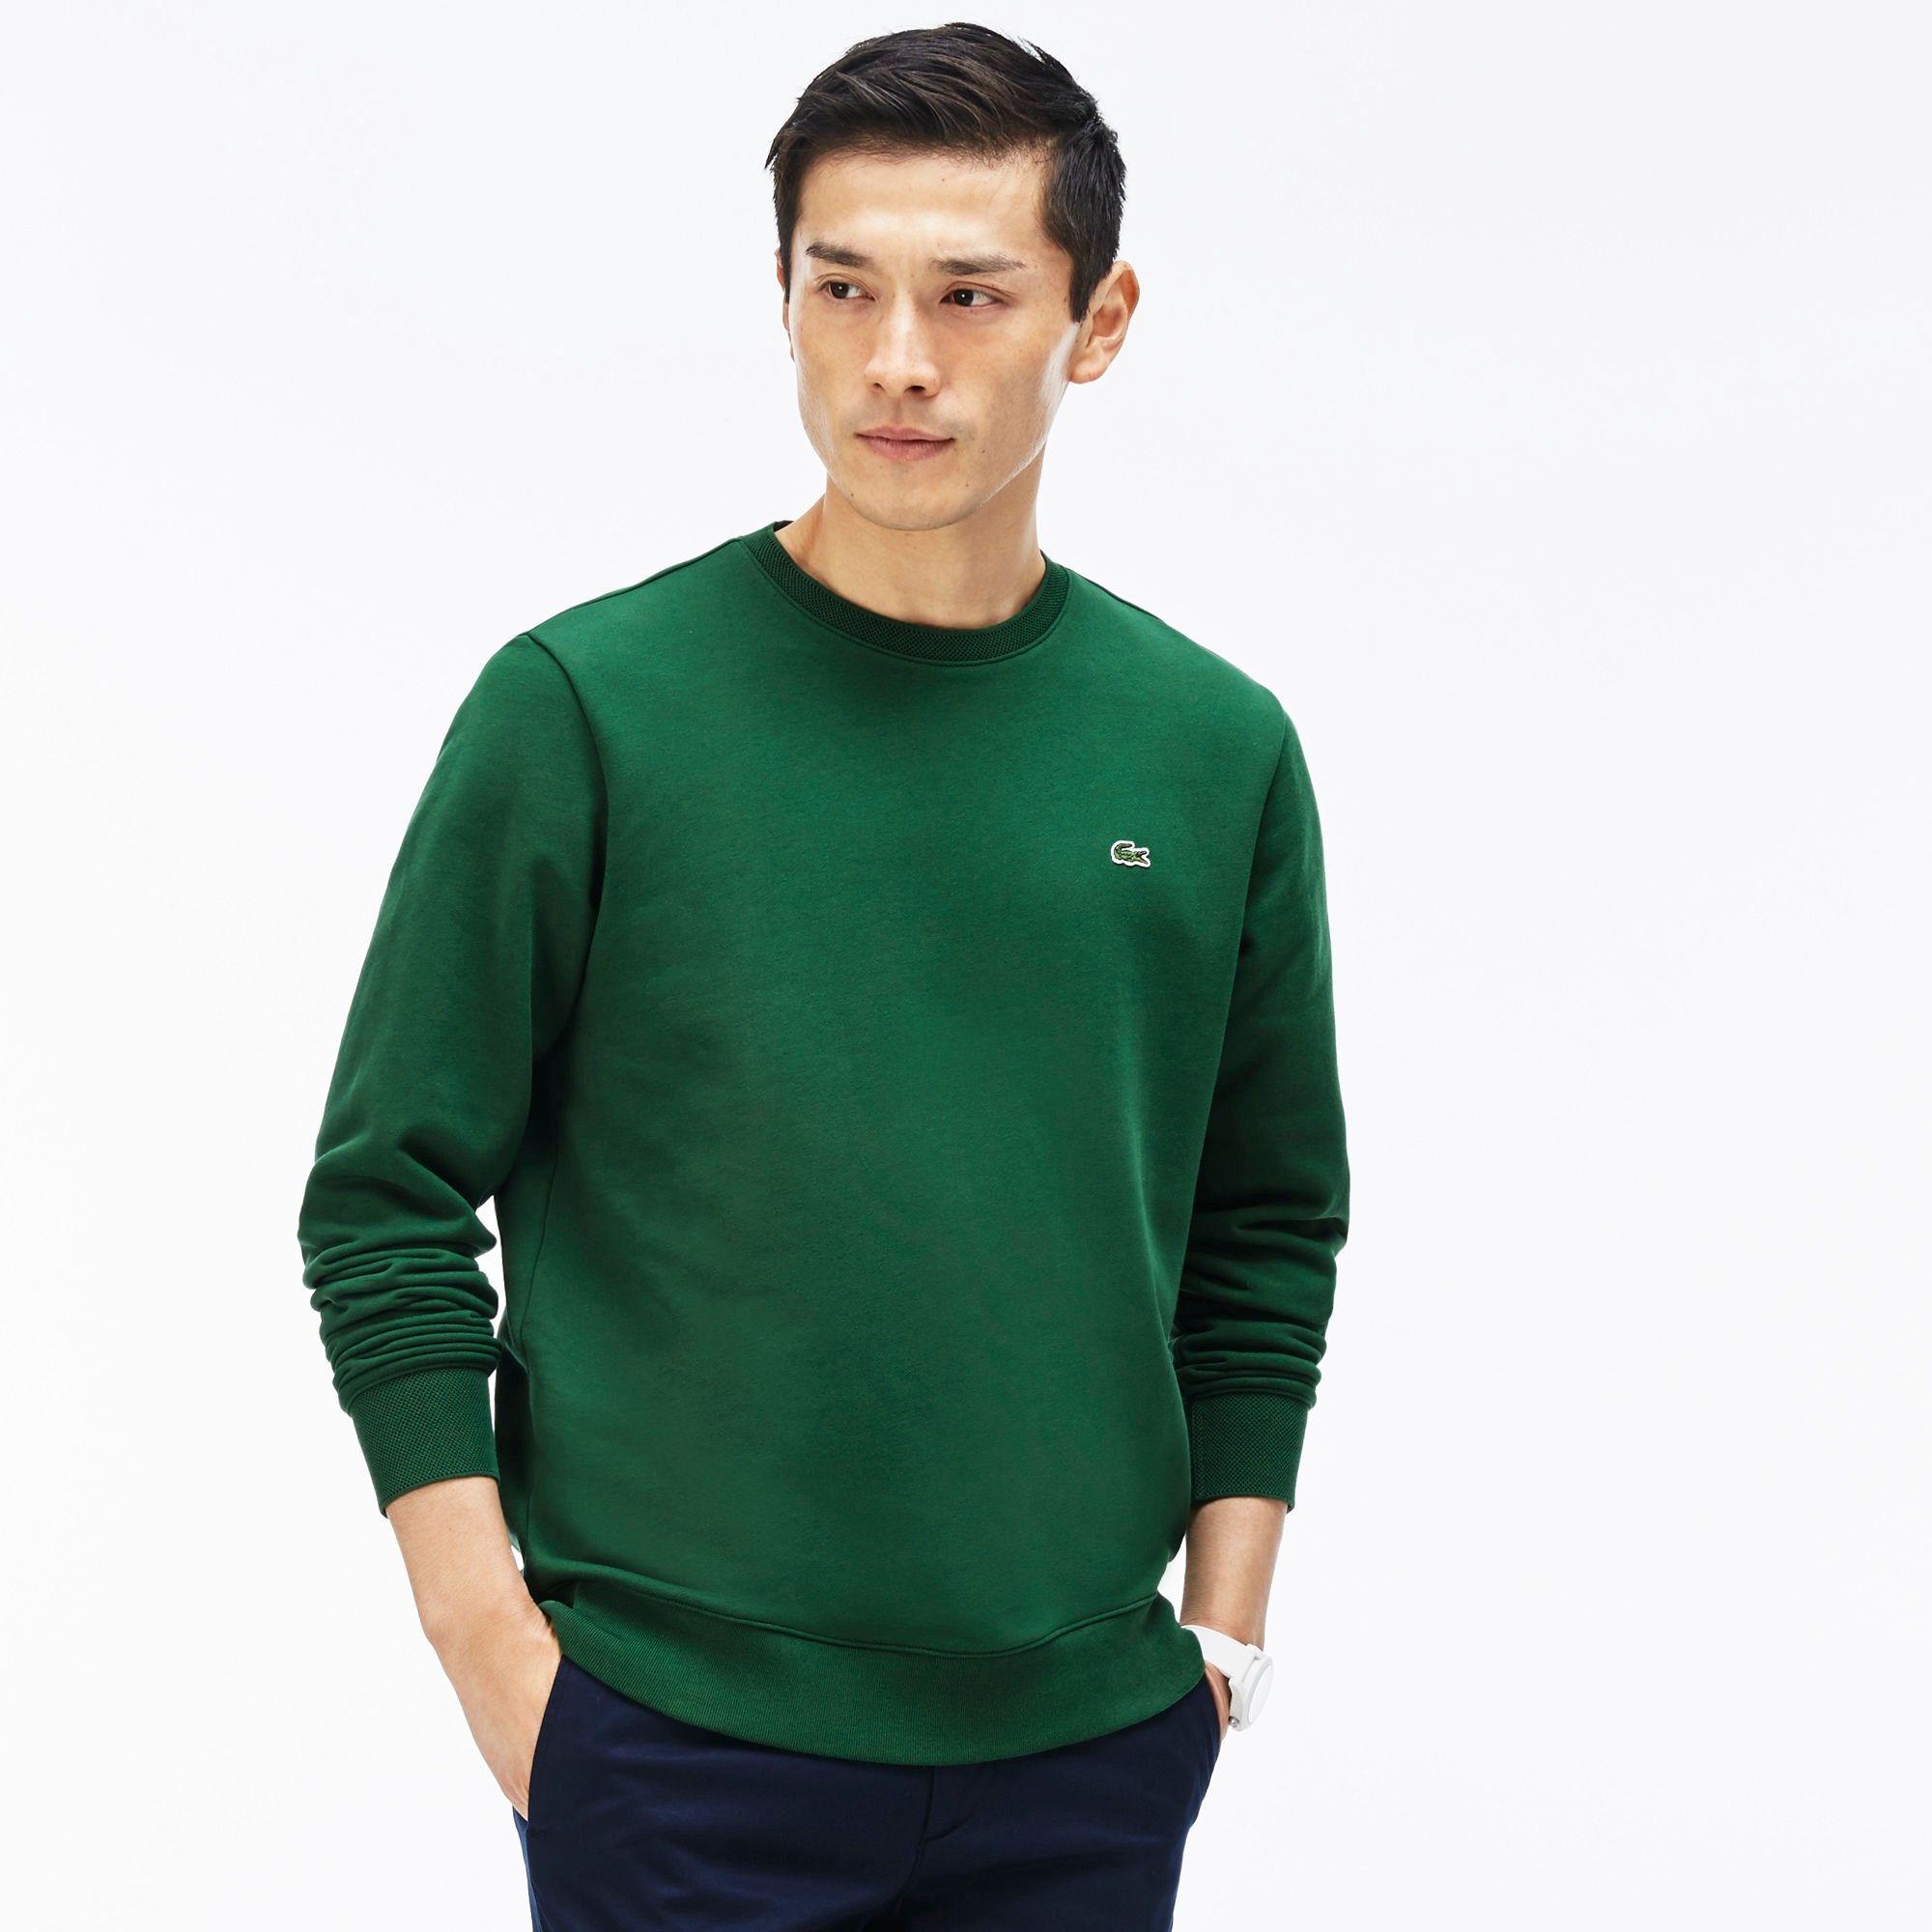 Lacoste Men S Fleece Sweatshirt Green Lacoste Cloth Lacoste Men Long Sleeve Tshirt Men Sweatshirt Fleece [ 2000 x 2000 Pixel ]